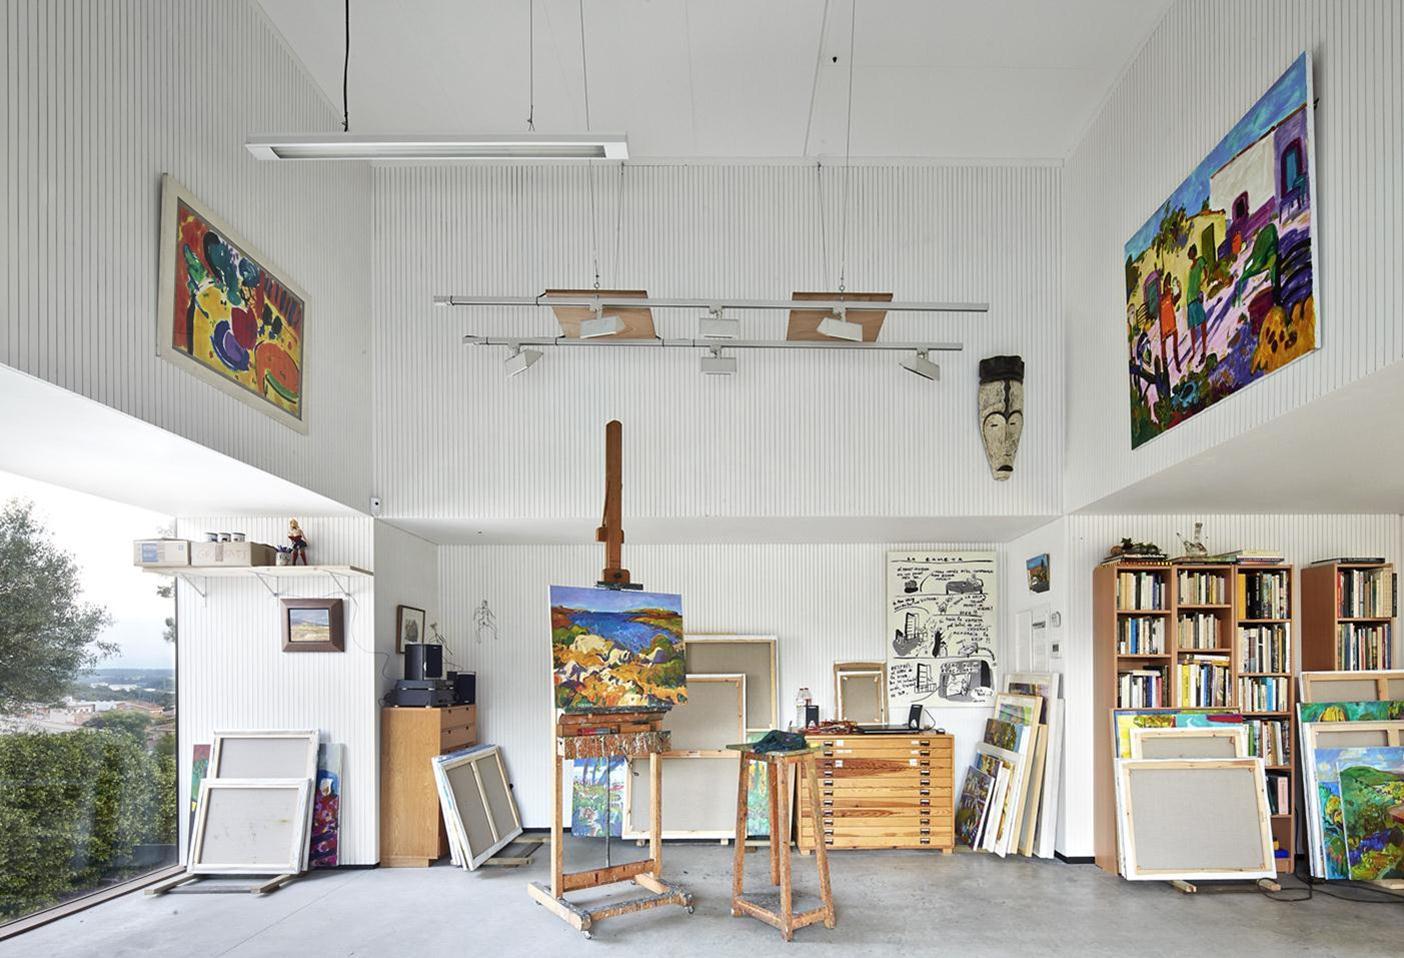 Artist's Studio / Josep Camps - Olga Felip (7)